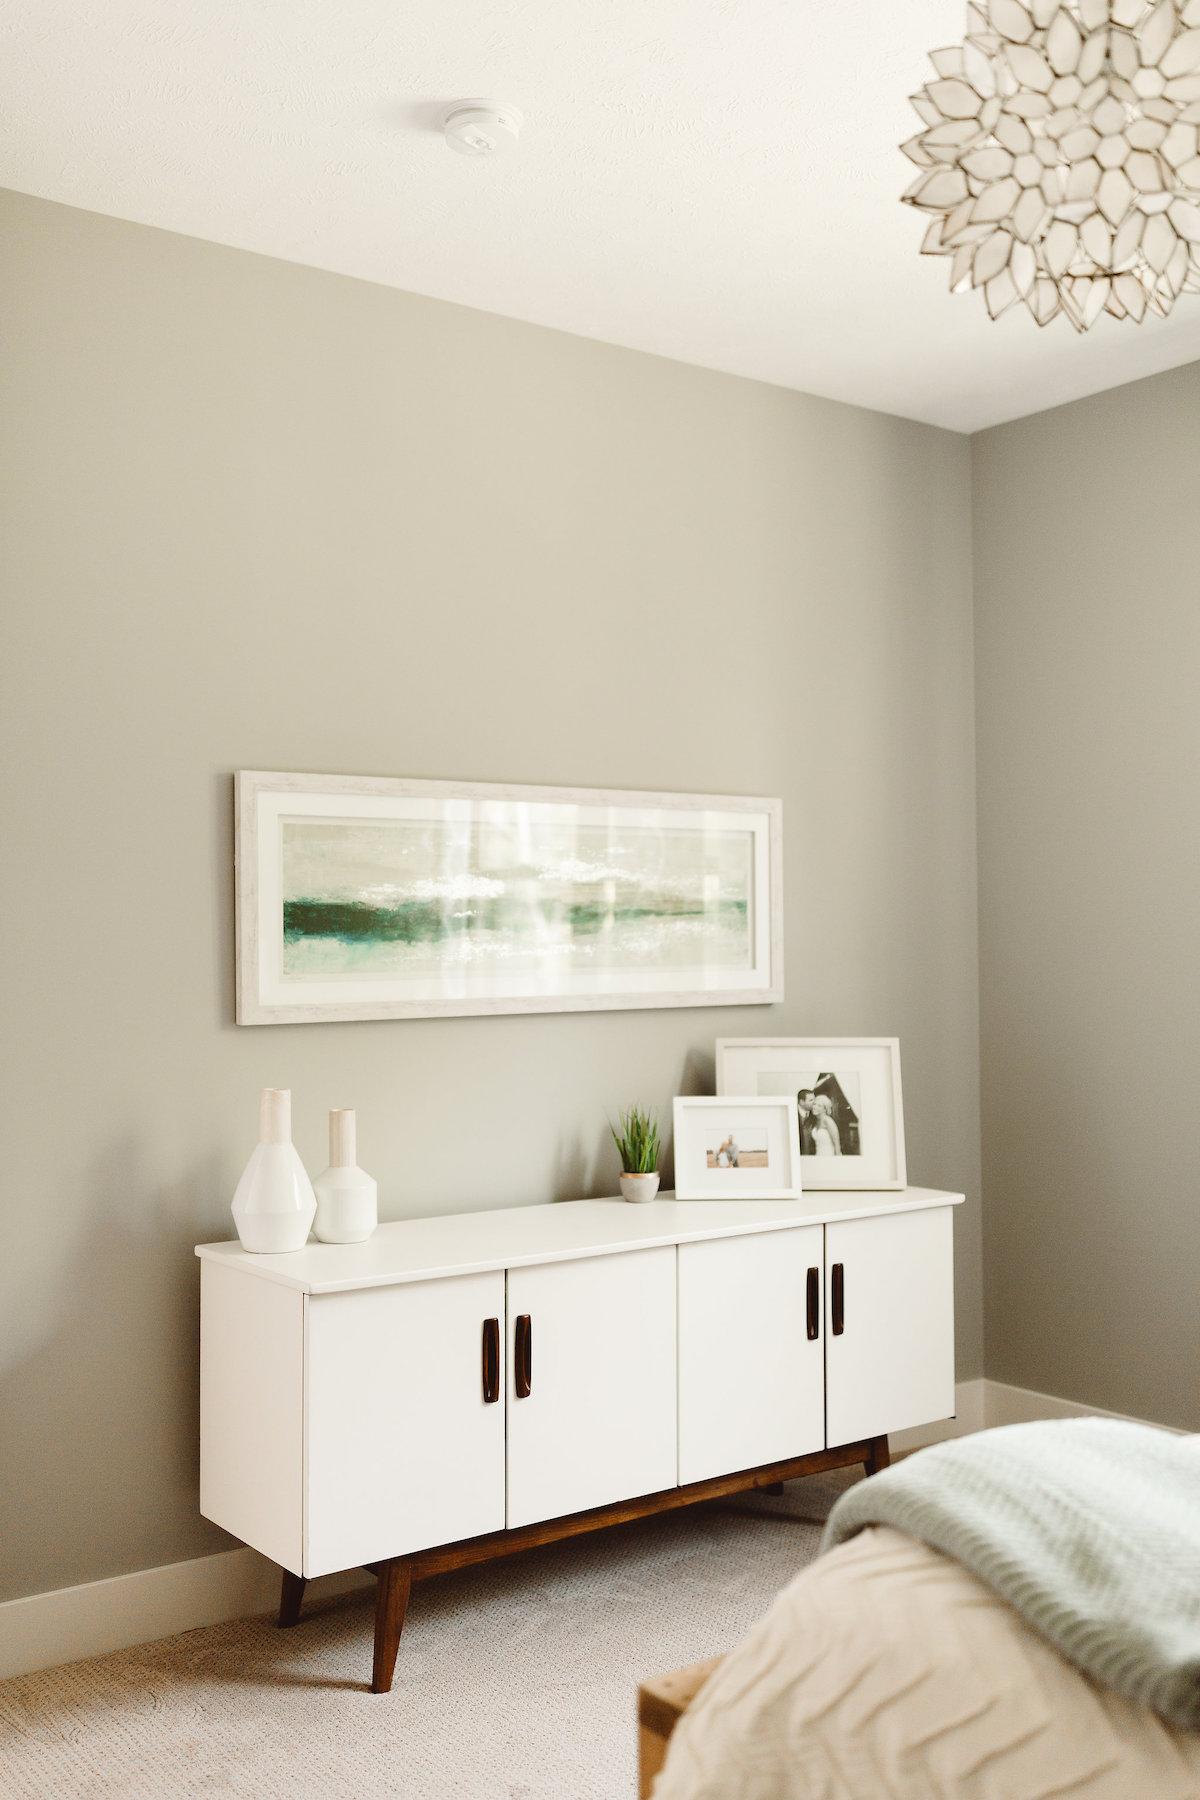 Modern Farmhouse New Build - Master Bedroom - Kate Brock Interior